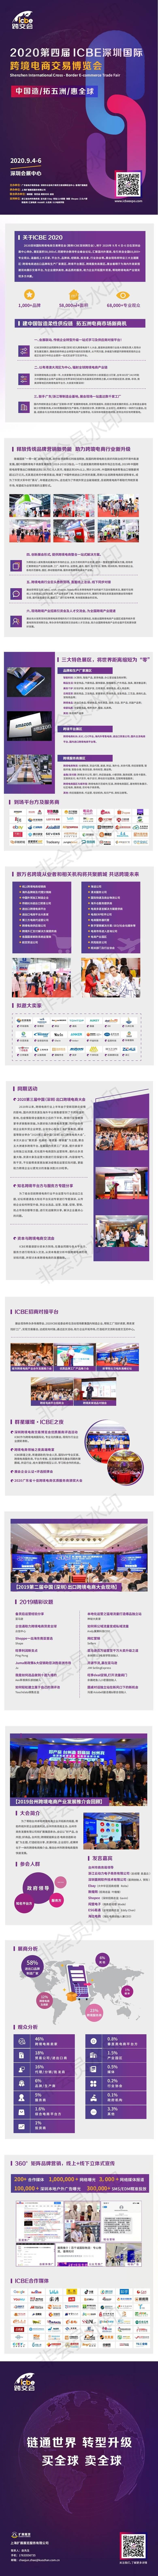 gaitubao_深圳国际跨境电商交易博览会_0_jpg.jpg